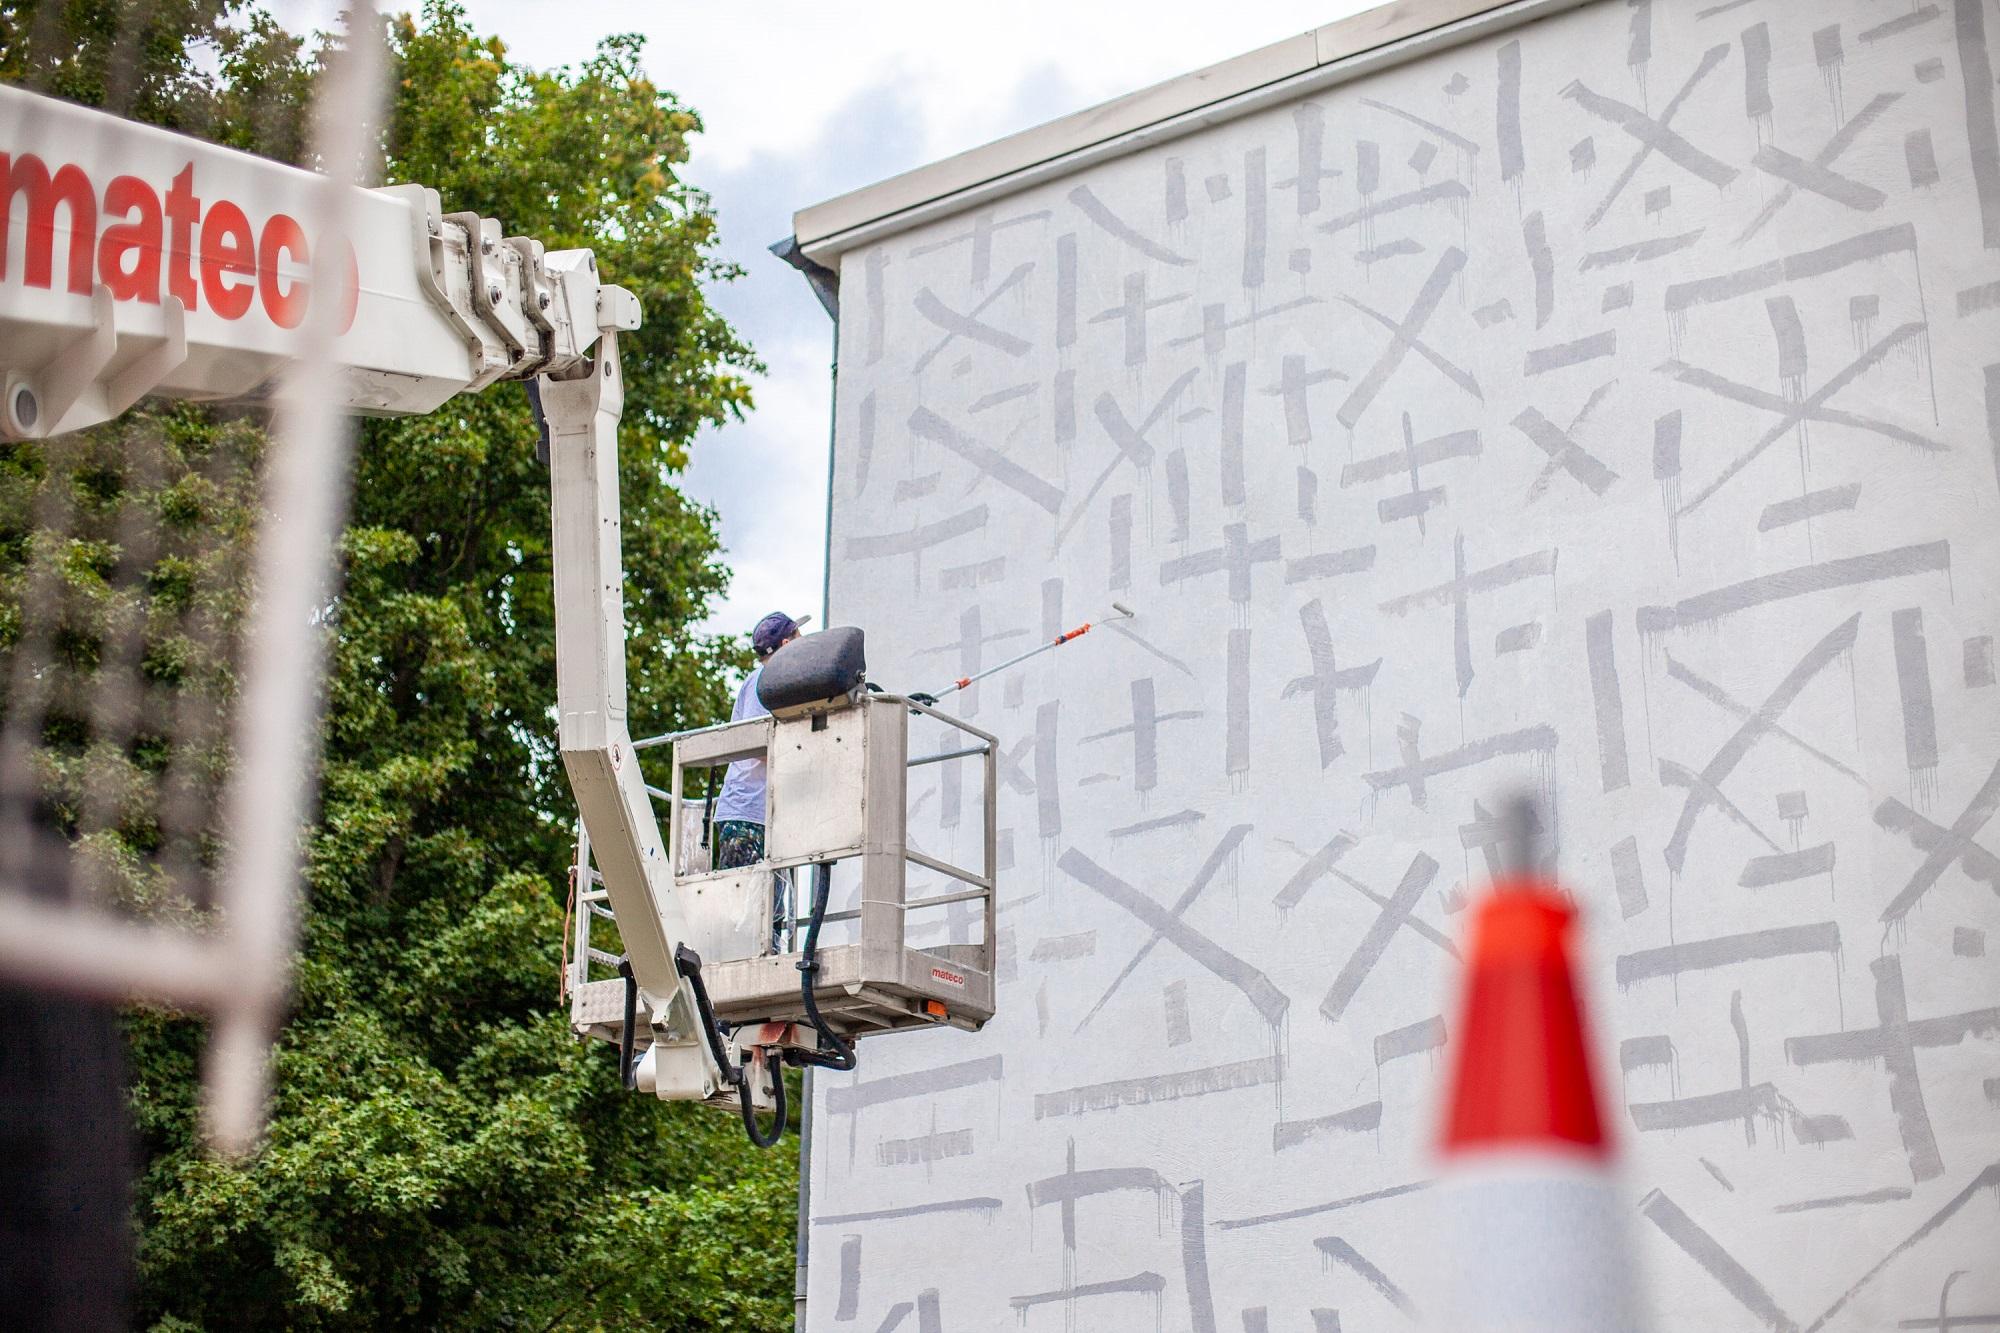 Waone Interesni Kazki Mannheim Stadt Wand Kunst